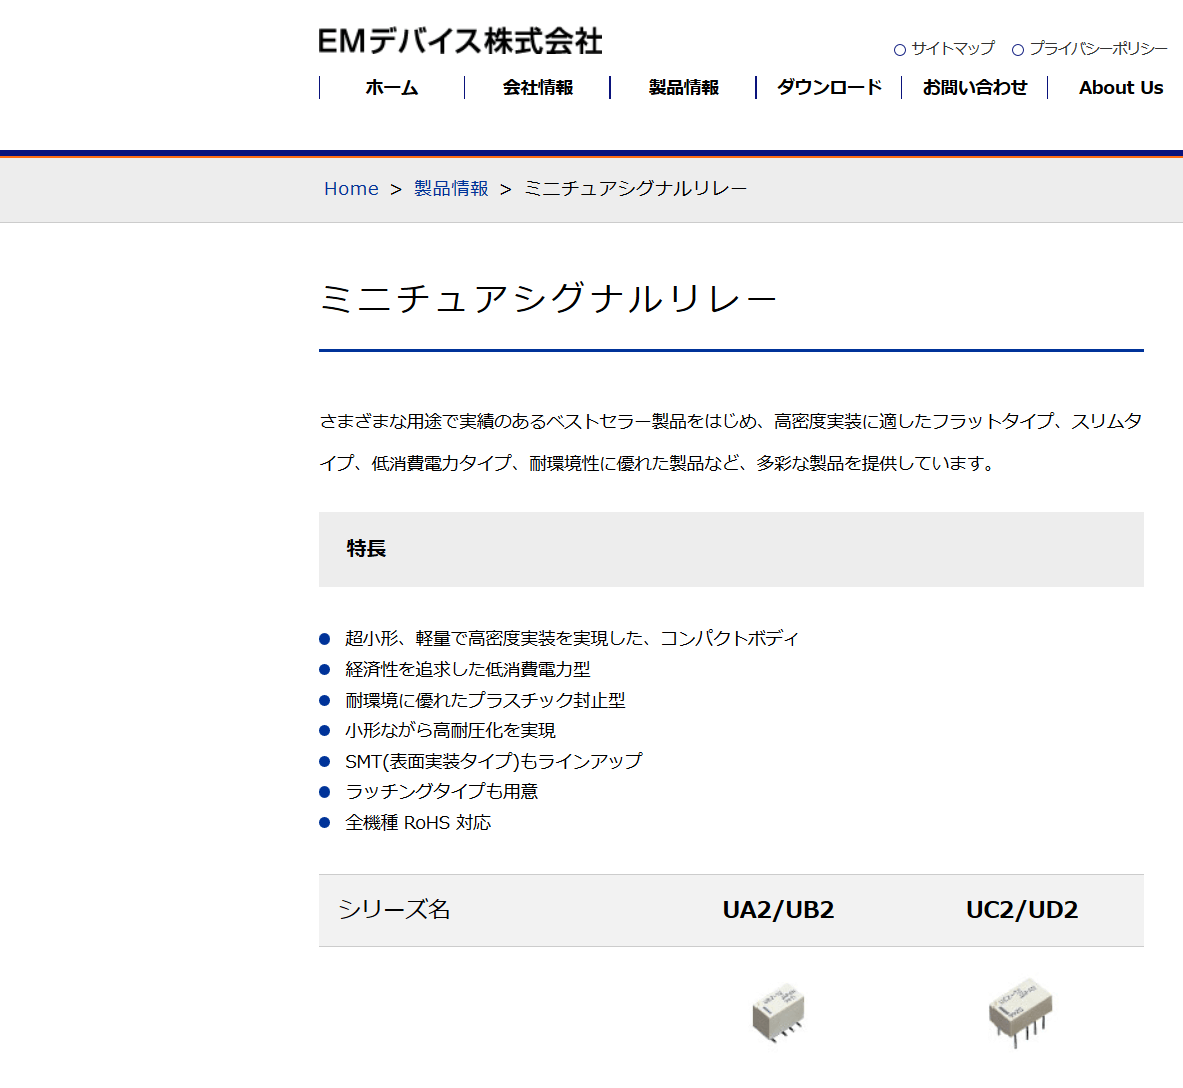 UA2/UB2